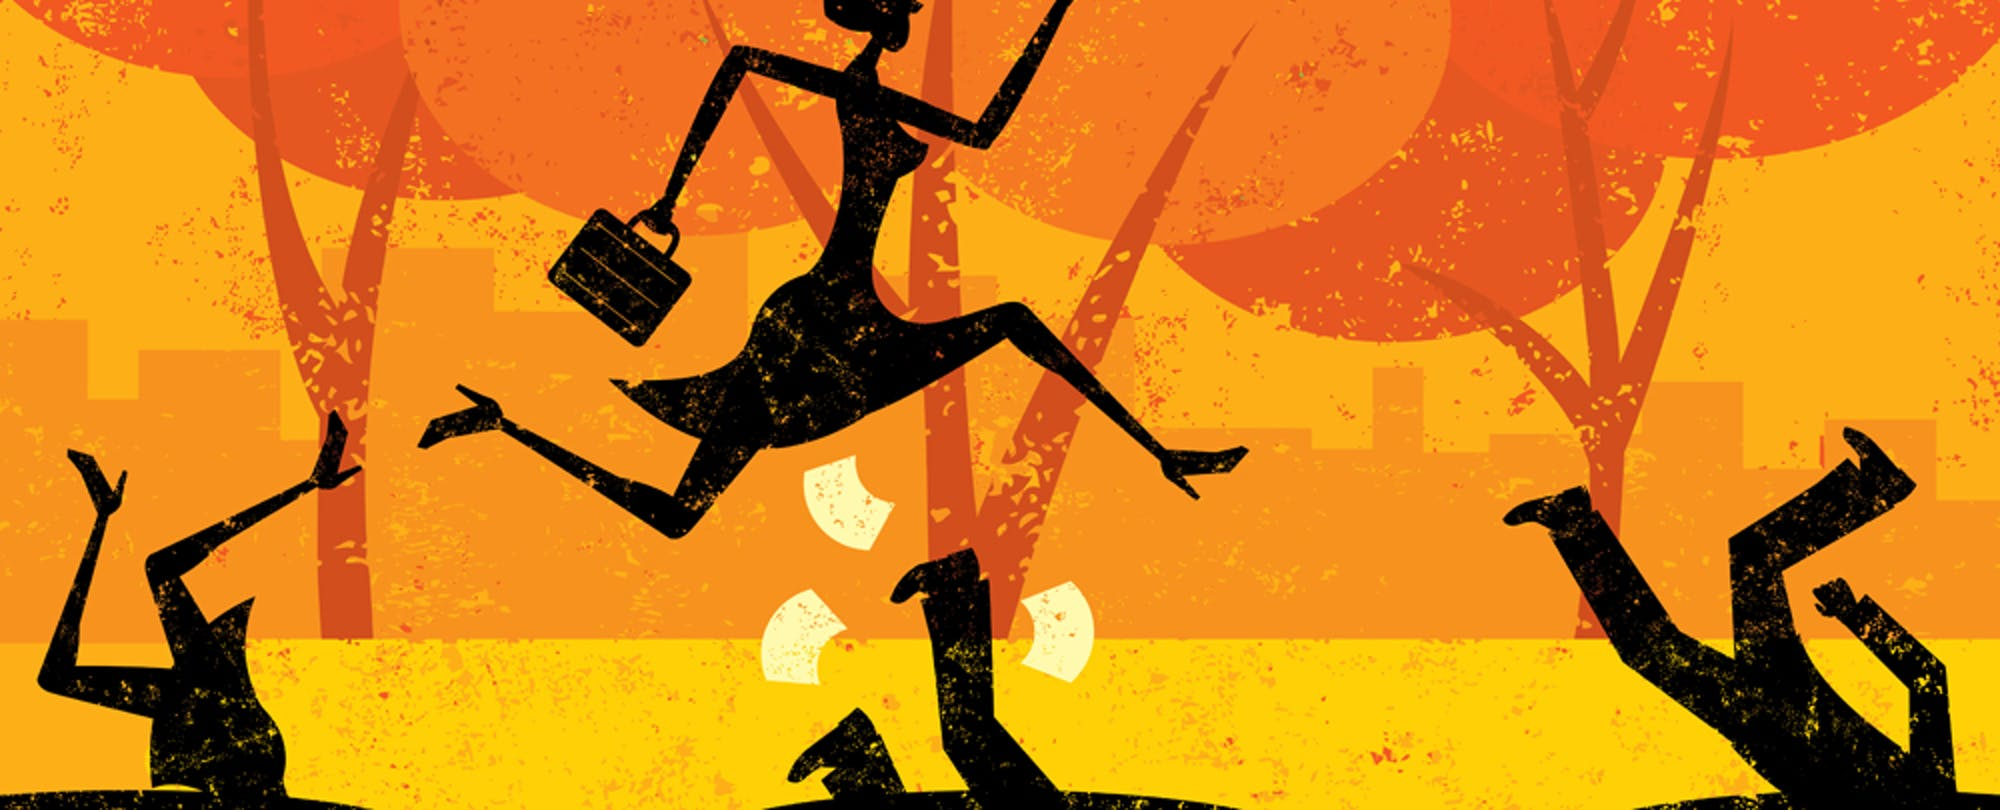 Adaptive Learning's Potential and Pitfalls